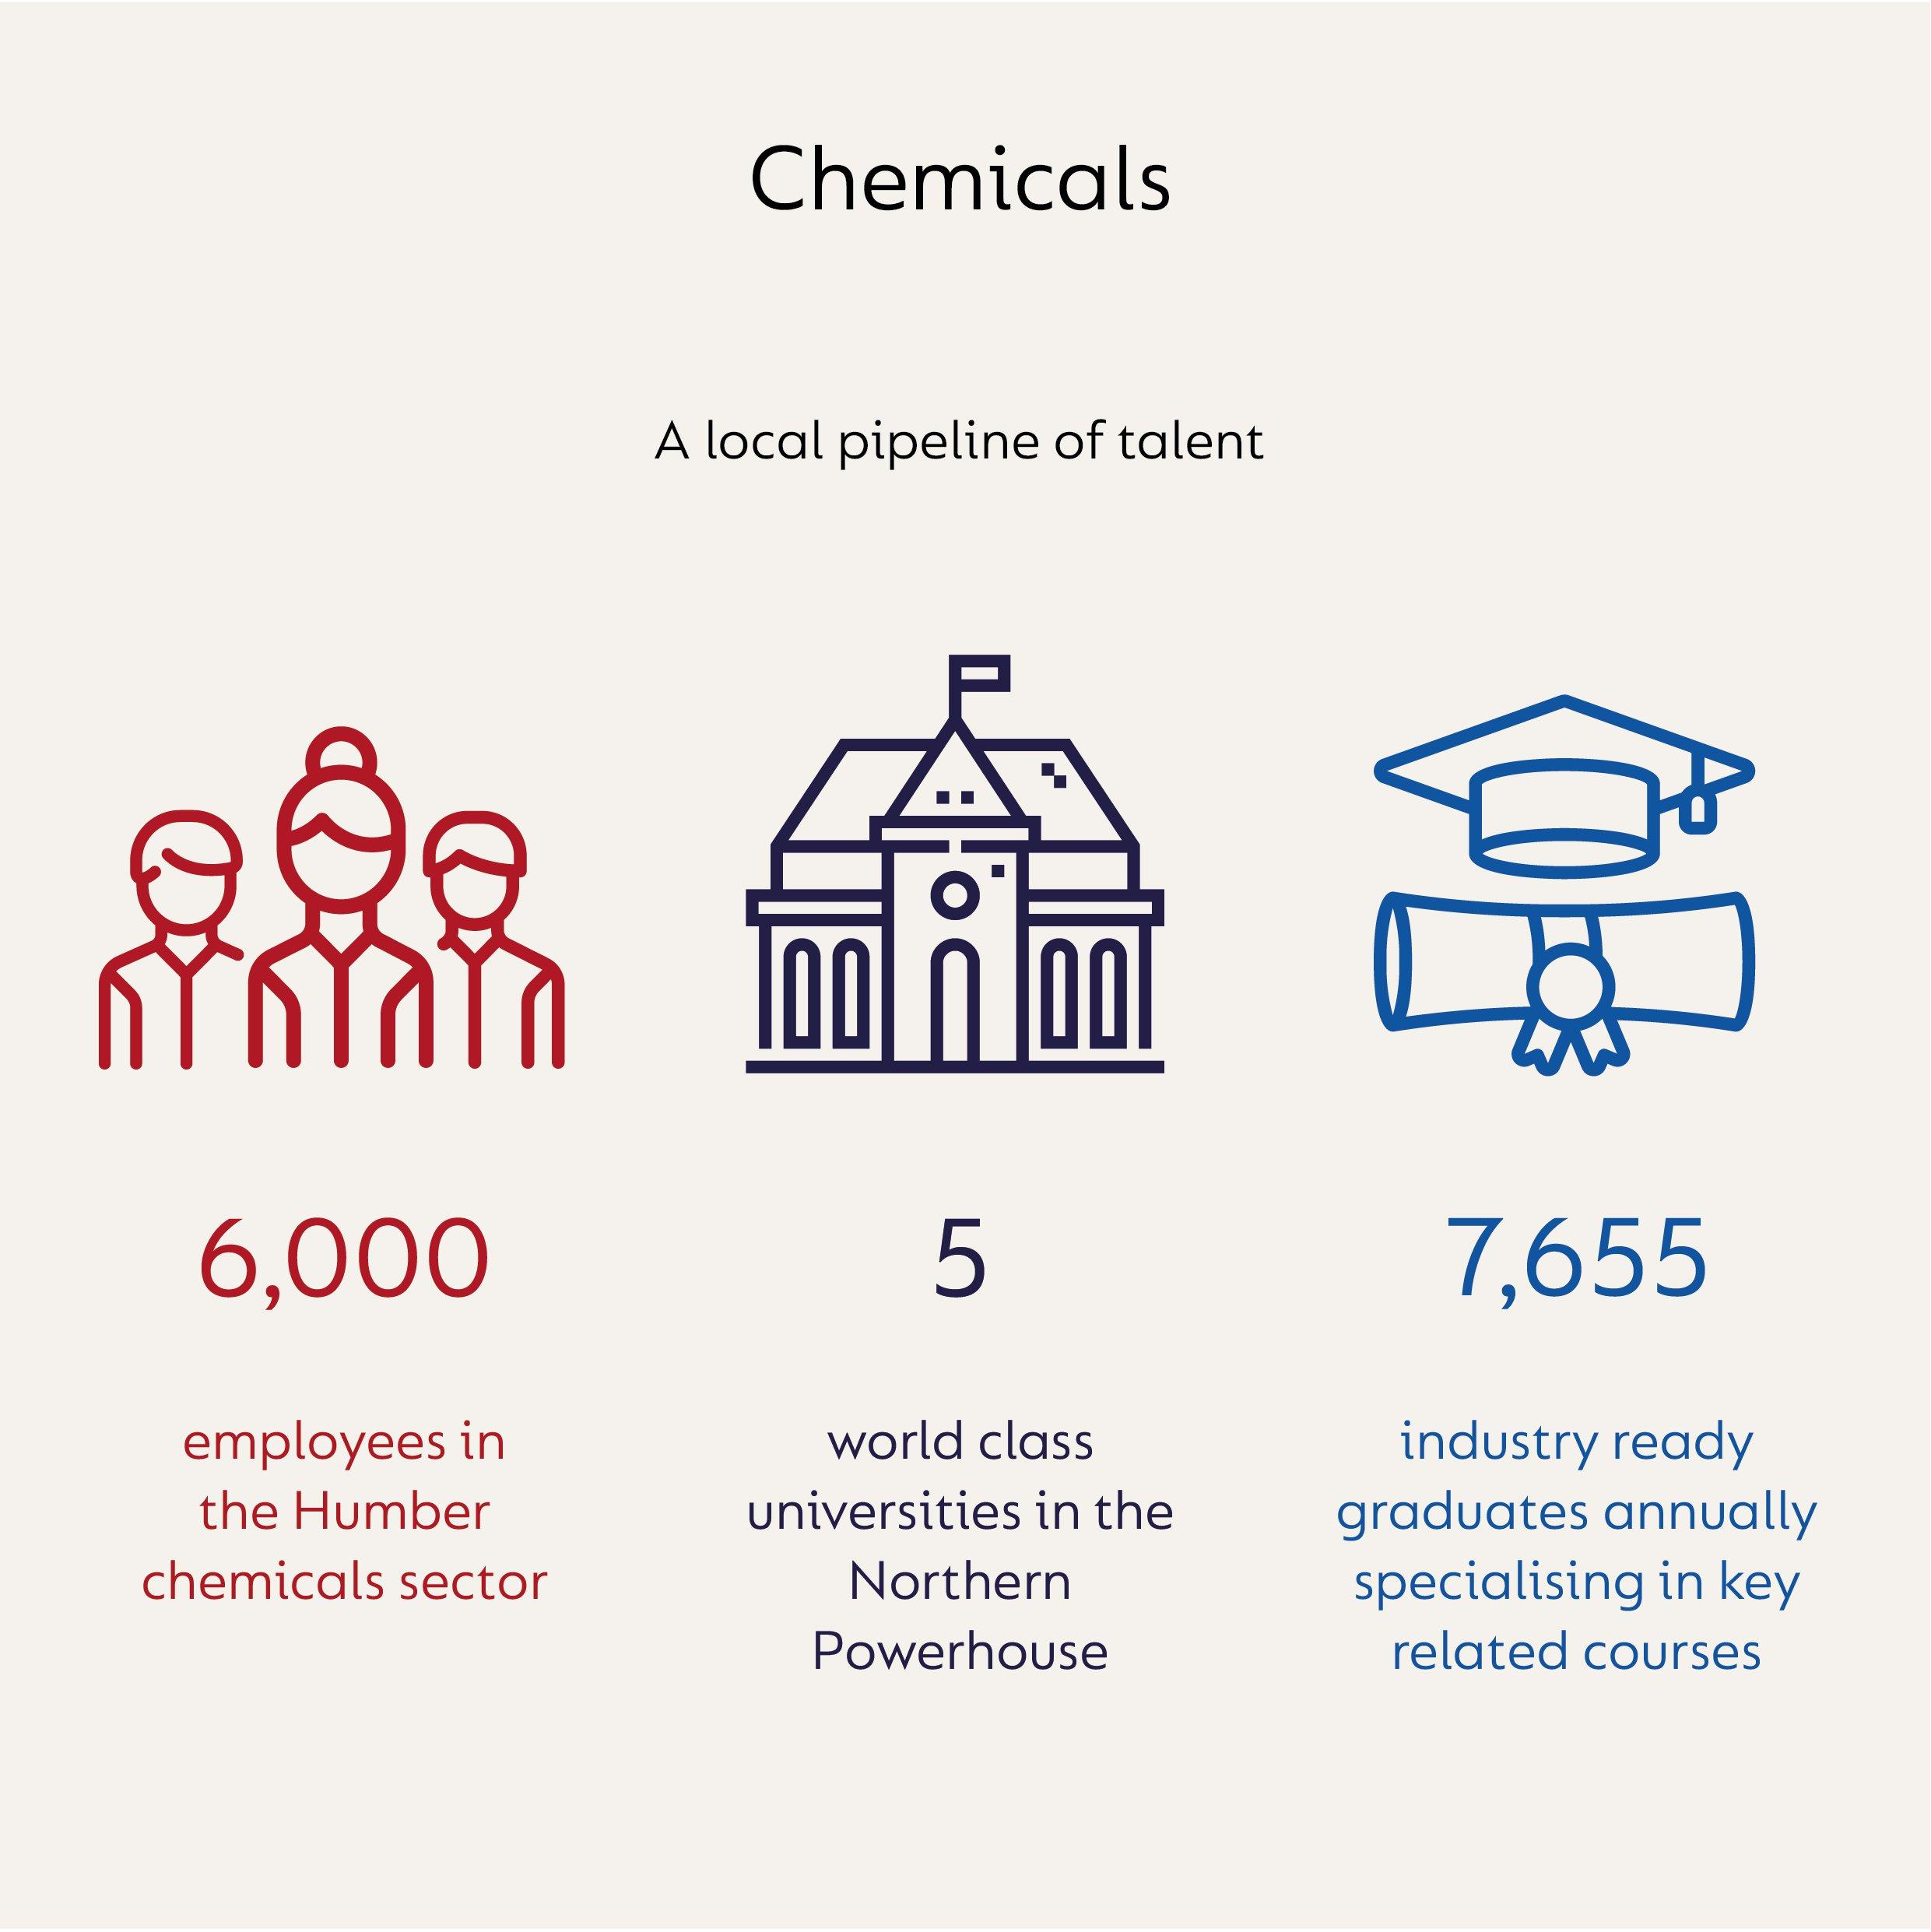 pipeline of talent - 6000 employees, 5 universities, 7655 graduates